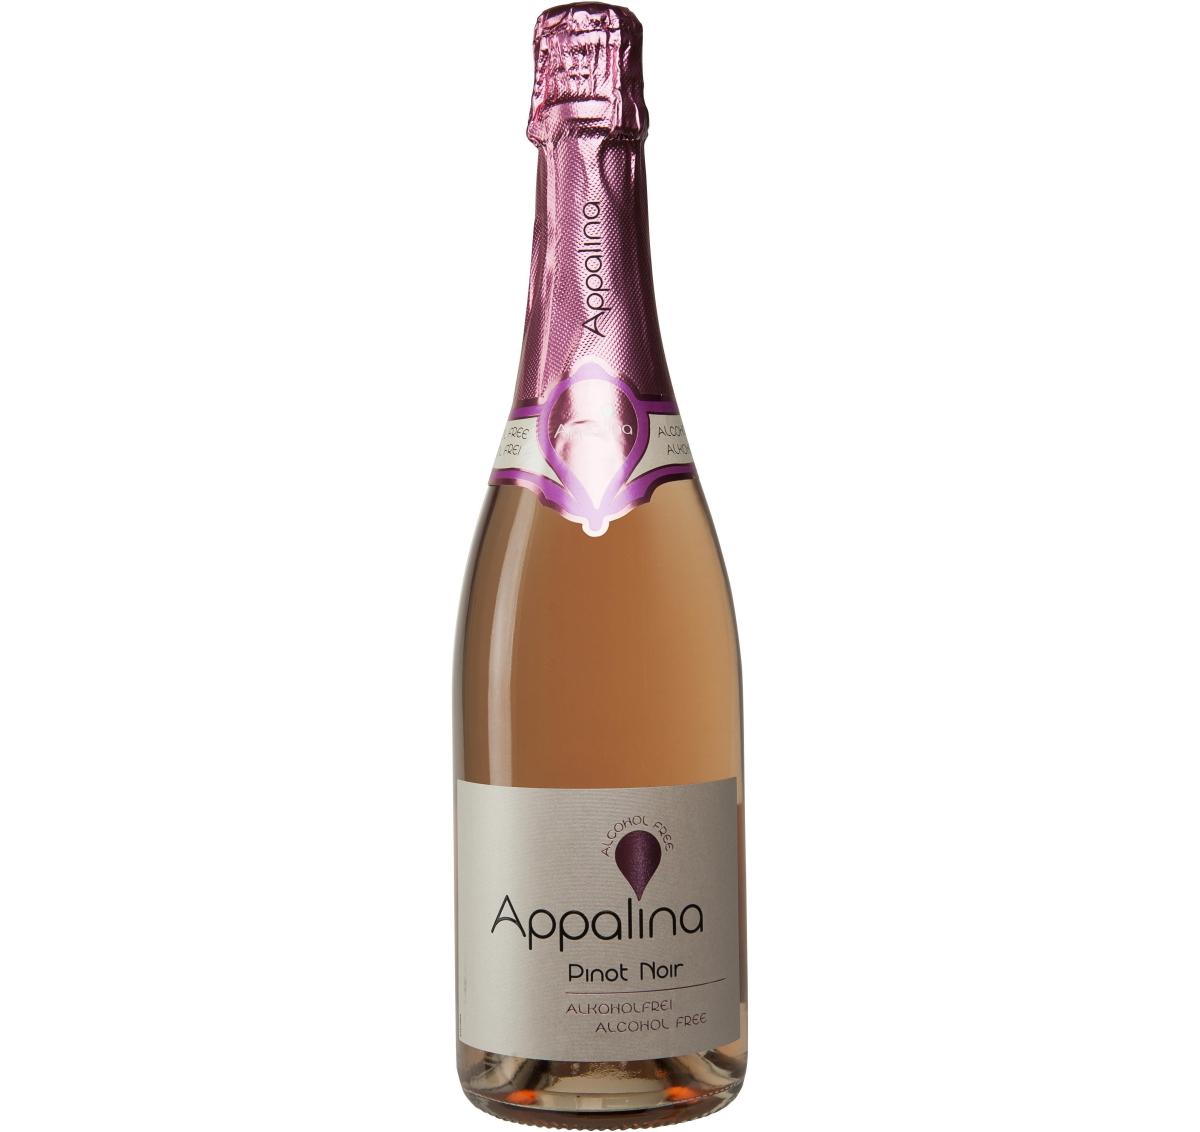 Appalina Pinot Noir - Alcoholvrij